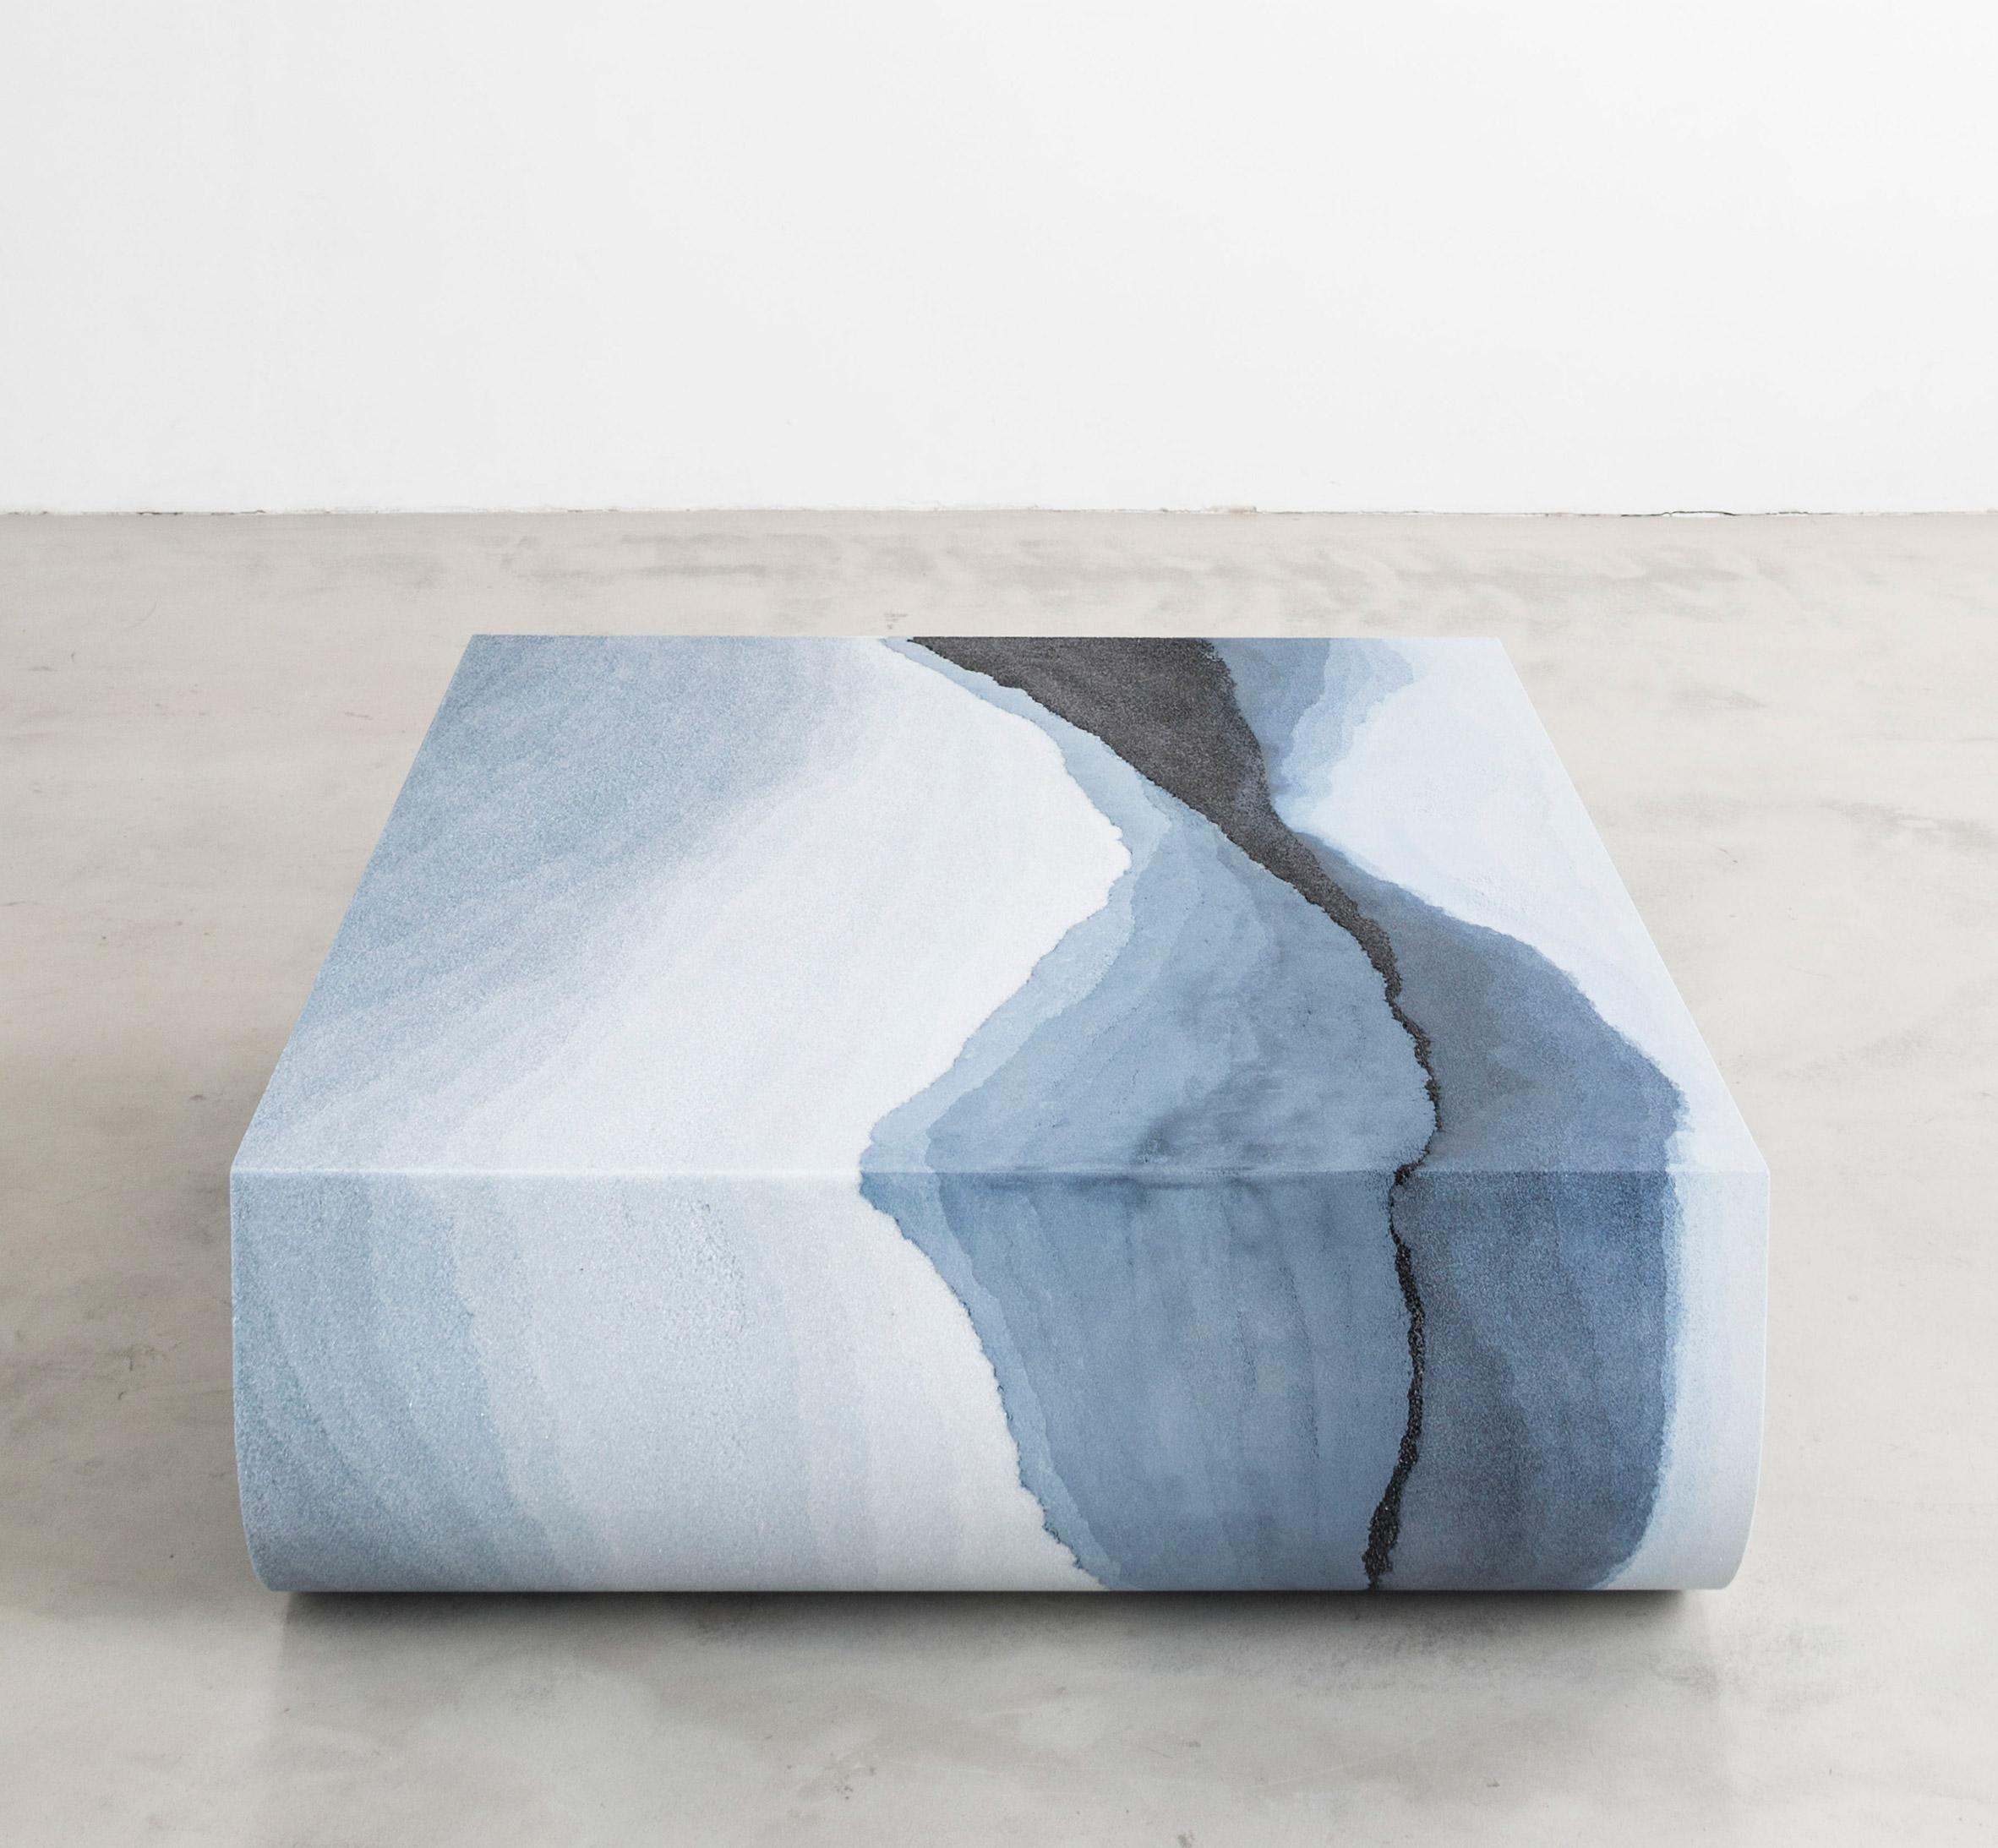 cary-whittier-escape-series-fernando-mastrangelo-furniture-gradient_dezeen_22